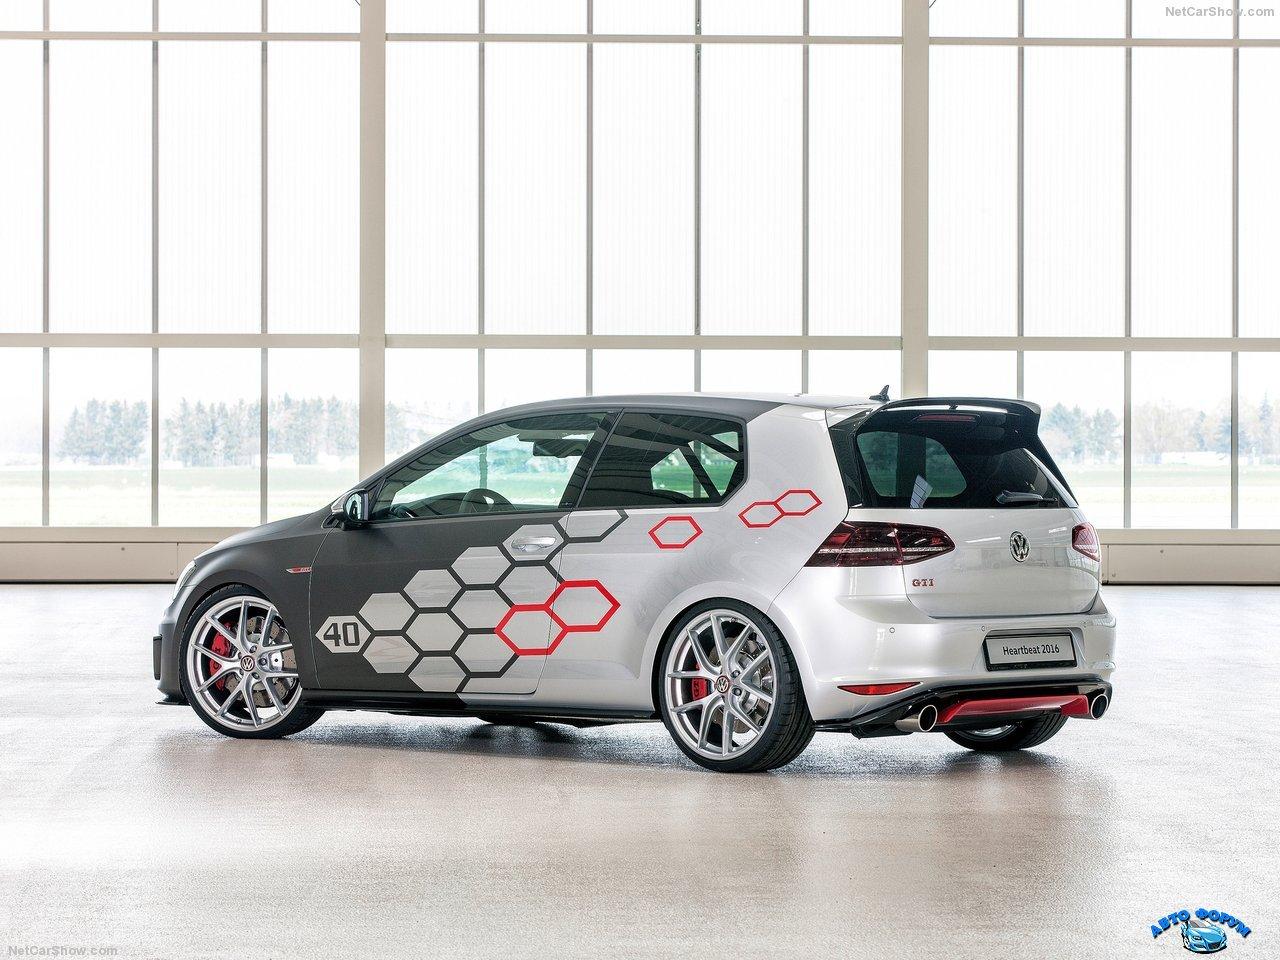 Volkswagen-Golf_GTI_Heartbeat_Concept-2016-1280-04.jpg